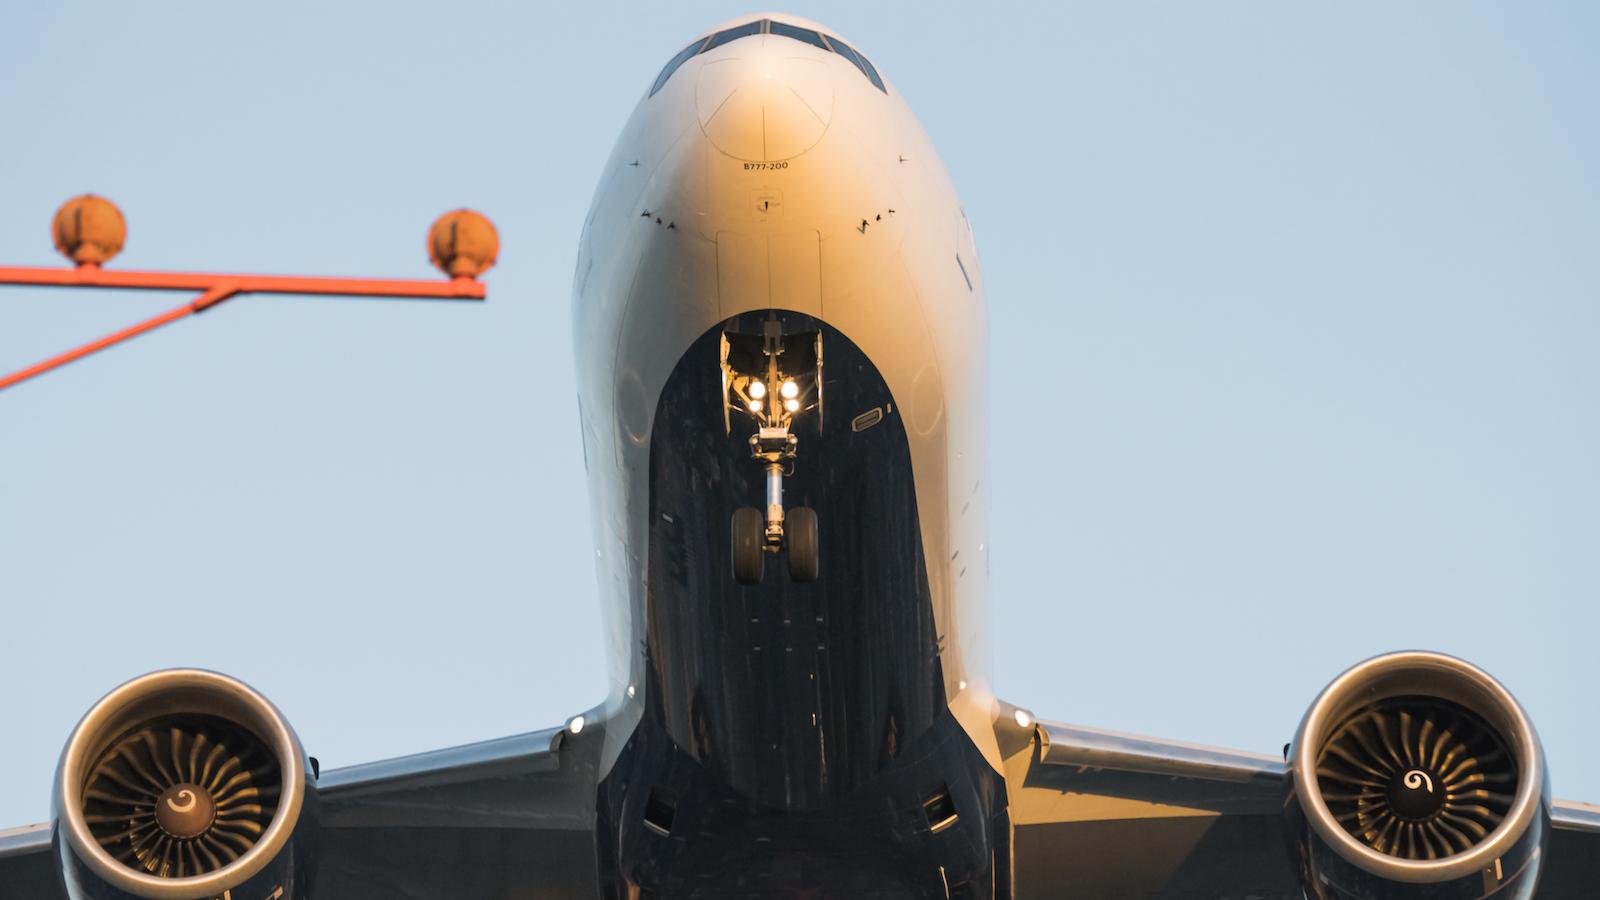 2. Tripod @ F9.0 1/2000sec 203mm ISO 5000 - Ultra Sharp focus again no hunting. Landing pole on left.